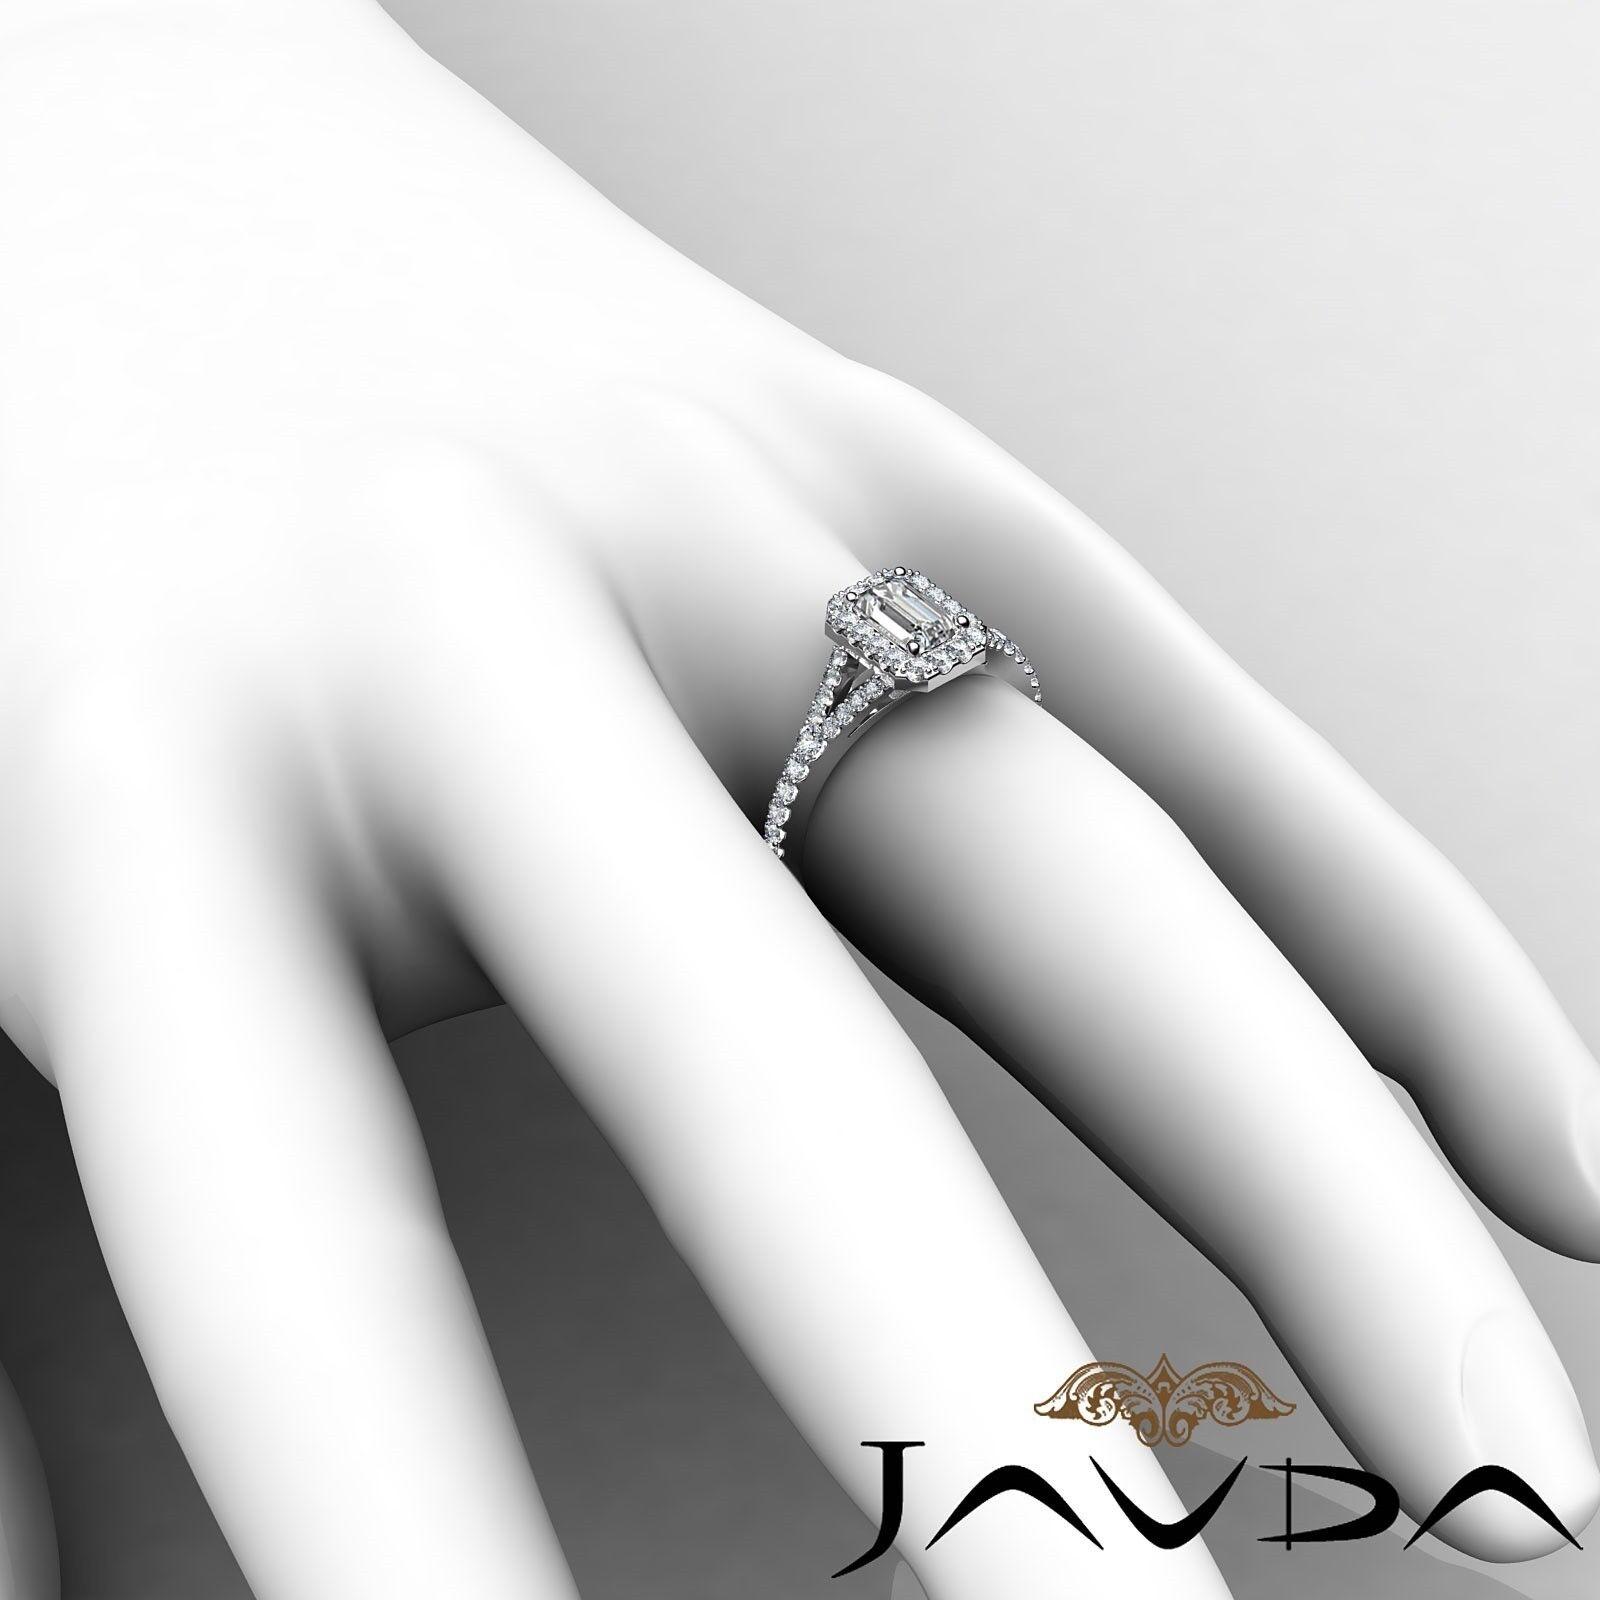 1.23ctw Halo U Pave Stone Emerald Diamond Engagement Ring GIA H-SI1 White Gold 4